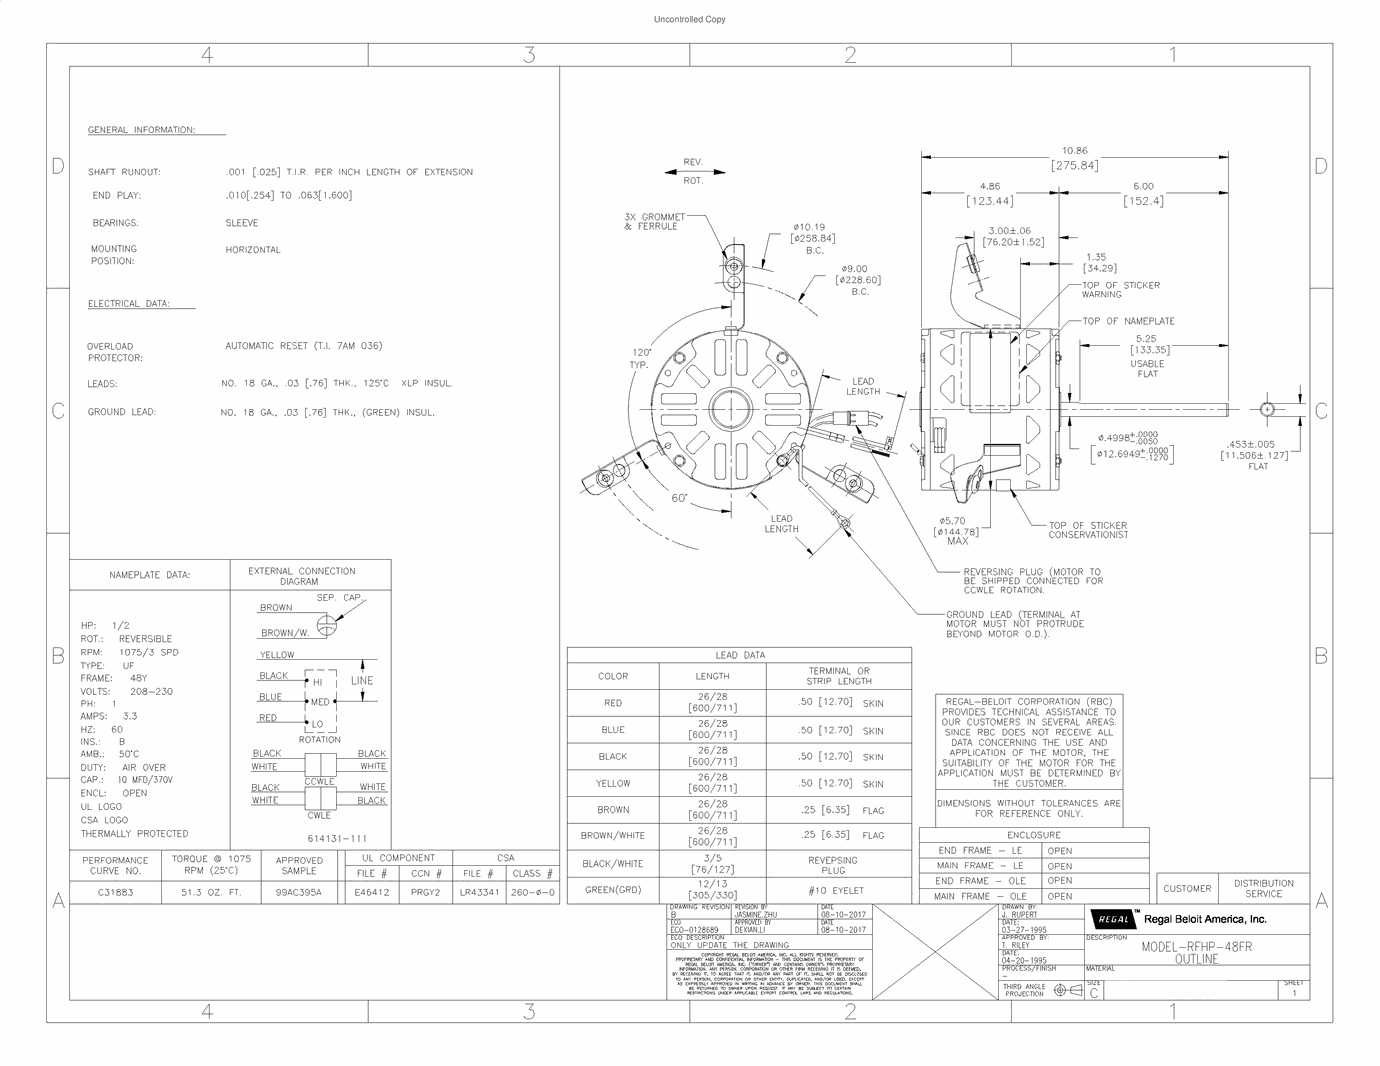 F48J28A38, AO Smith(now Century), 1/2HP, 208-230V